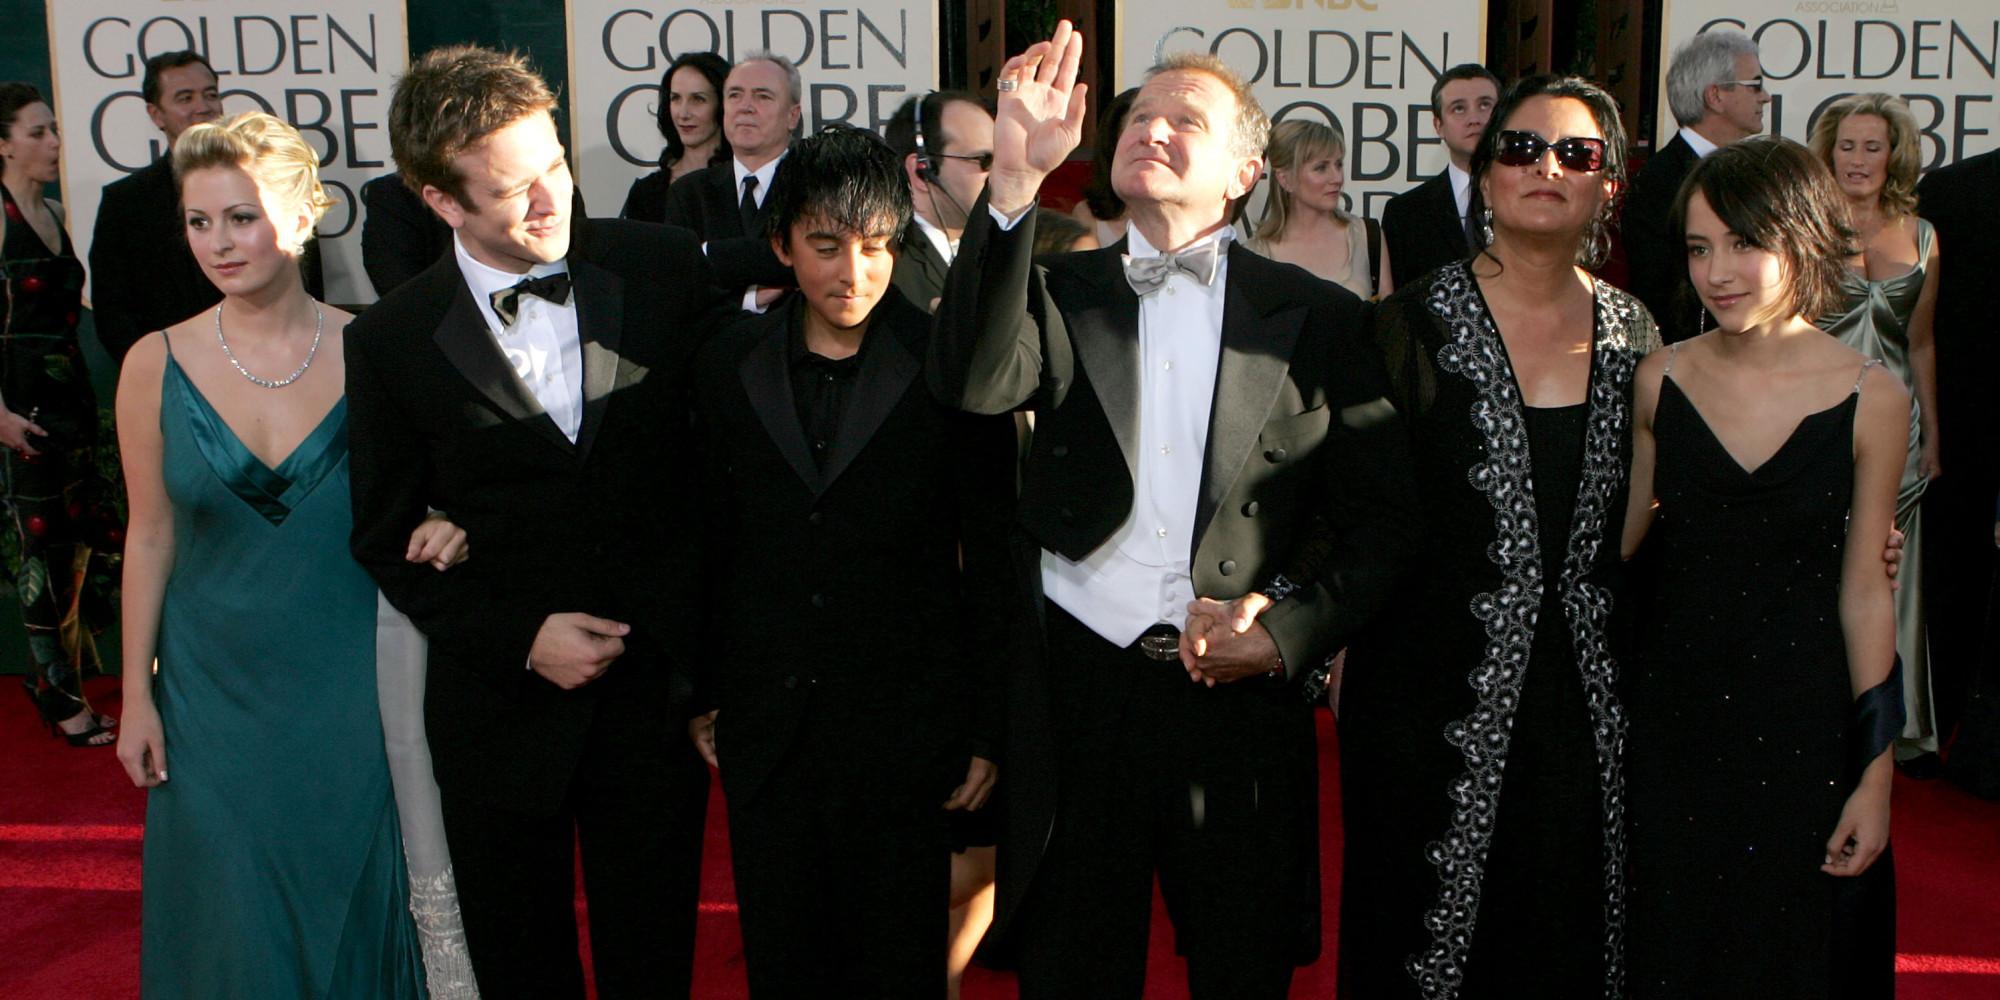 Robin Williams Family O robin williams zelda